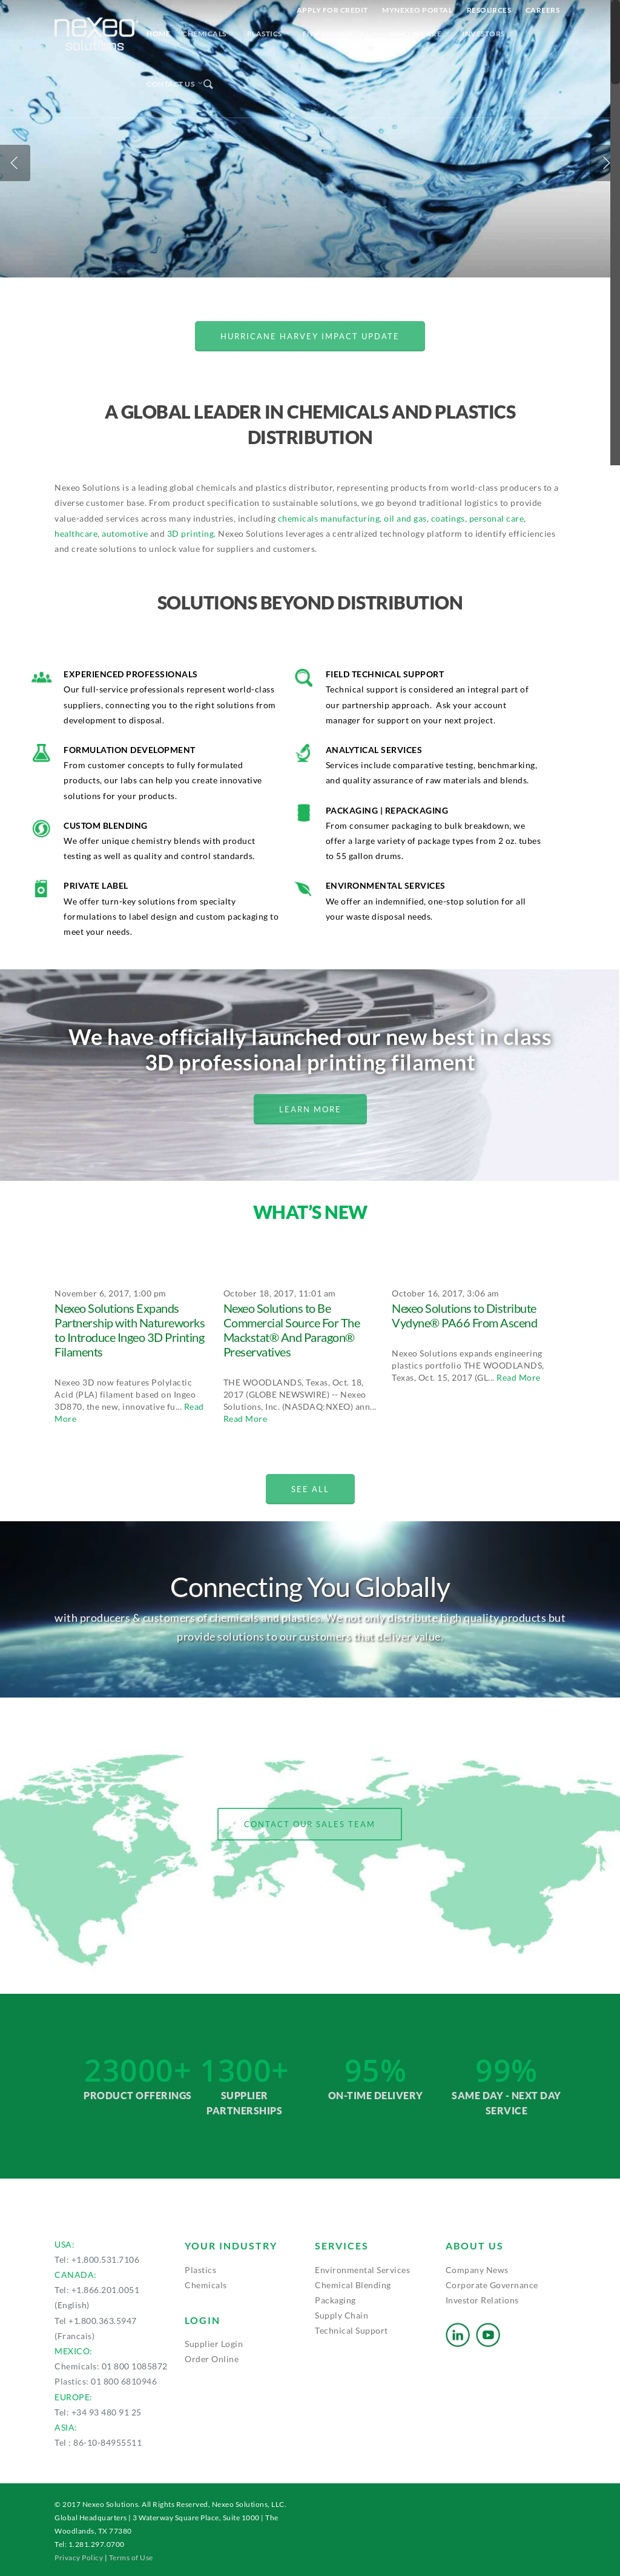 Nexeo Solutions's Latest News, Blogs, Press Releases & Videos